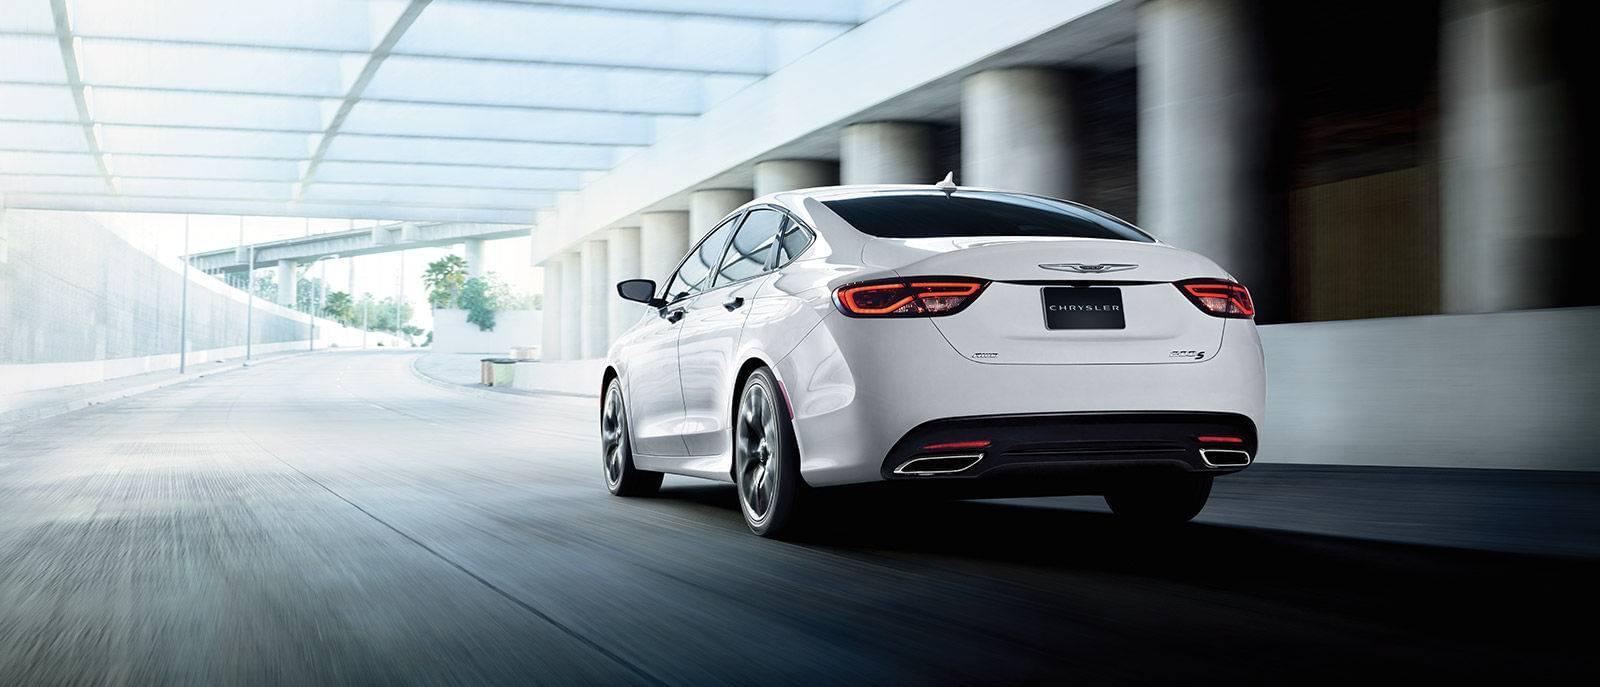 2016 Chrysler 200 Stylish Exterior Rear